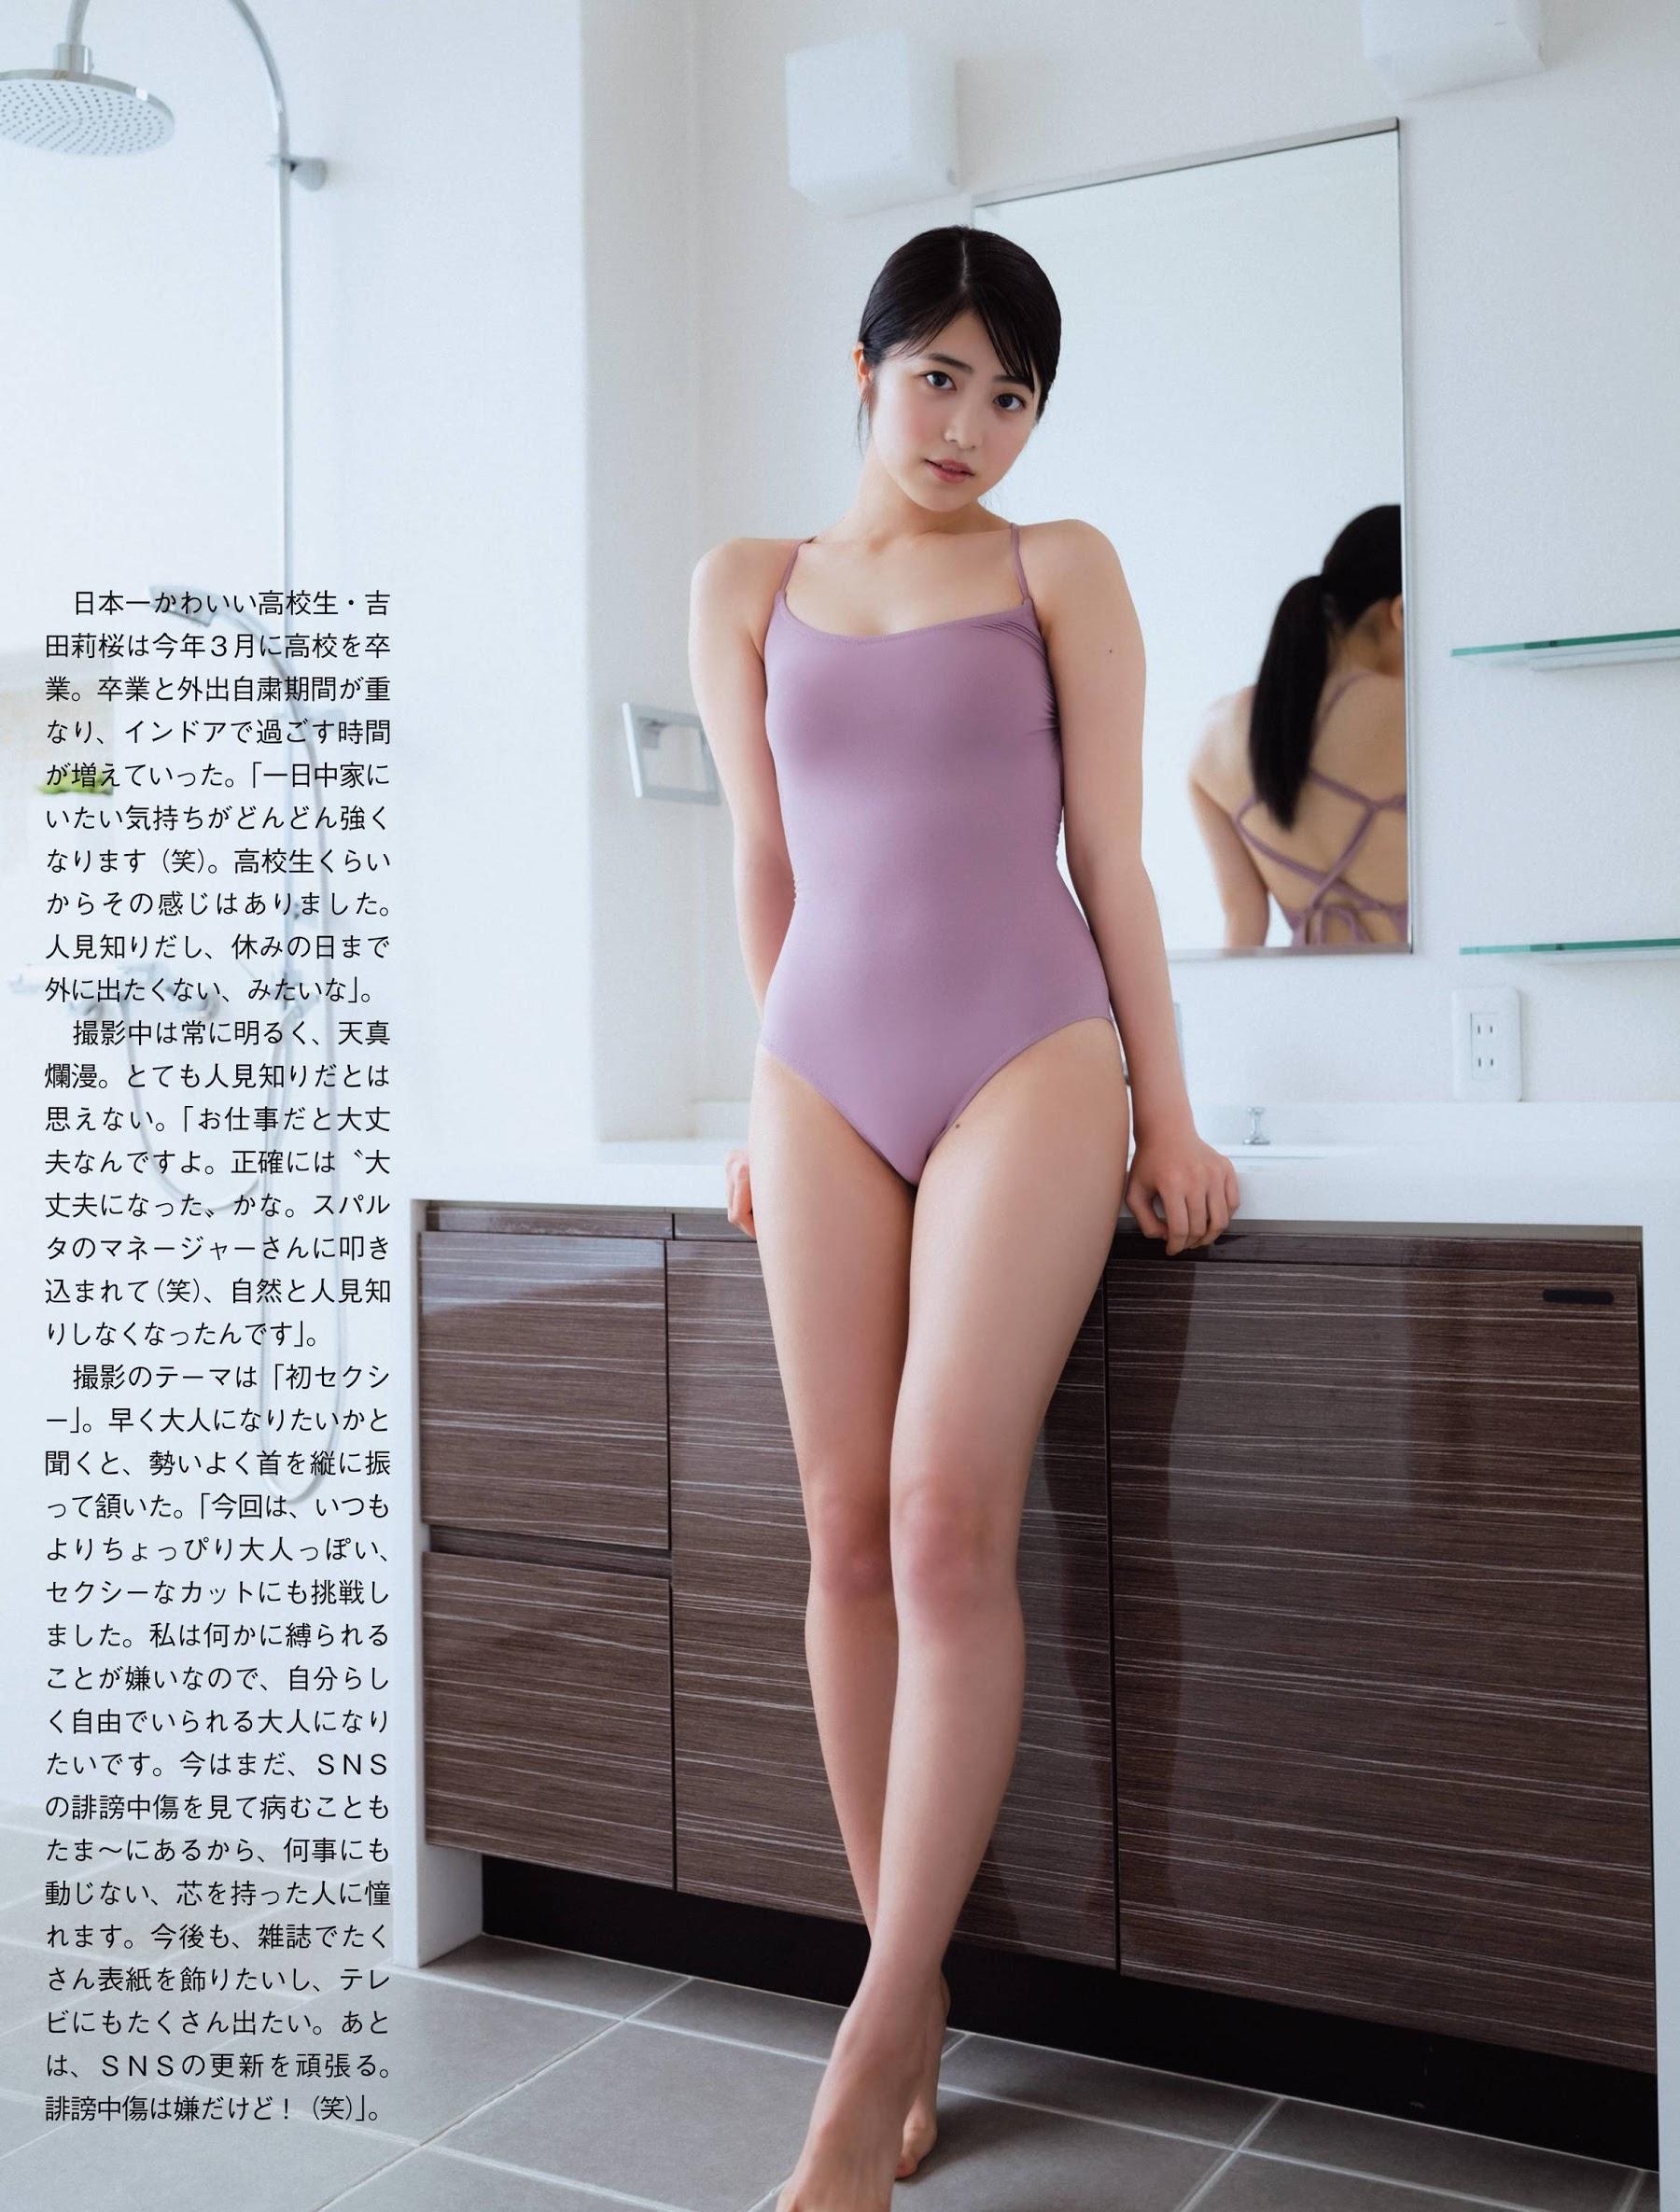 Photo Book BakaSelling 18-YearOld Angels First Sexy Yoshida Rio 2020006